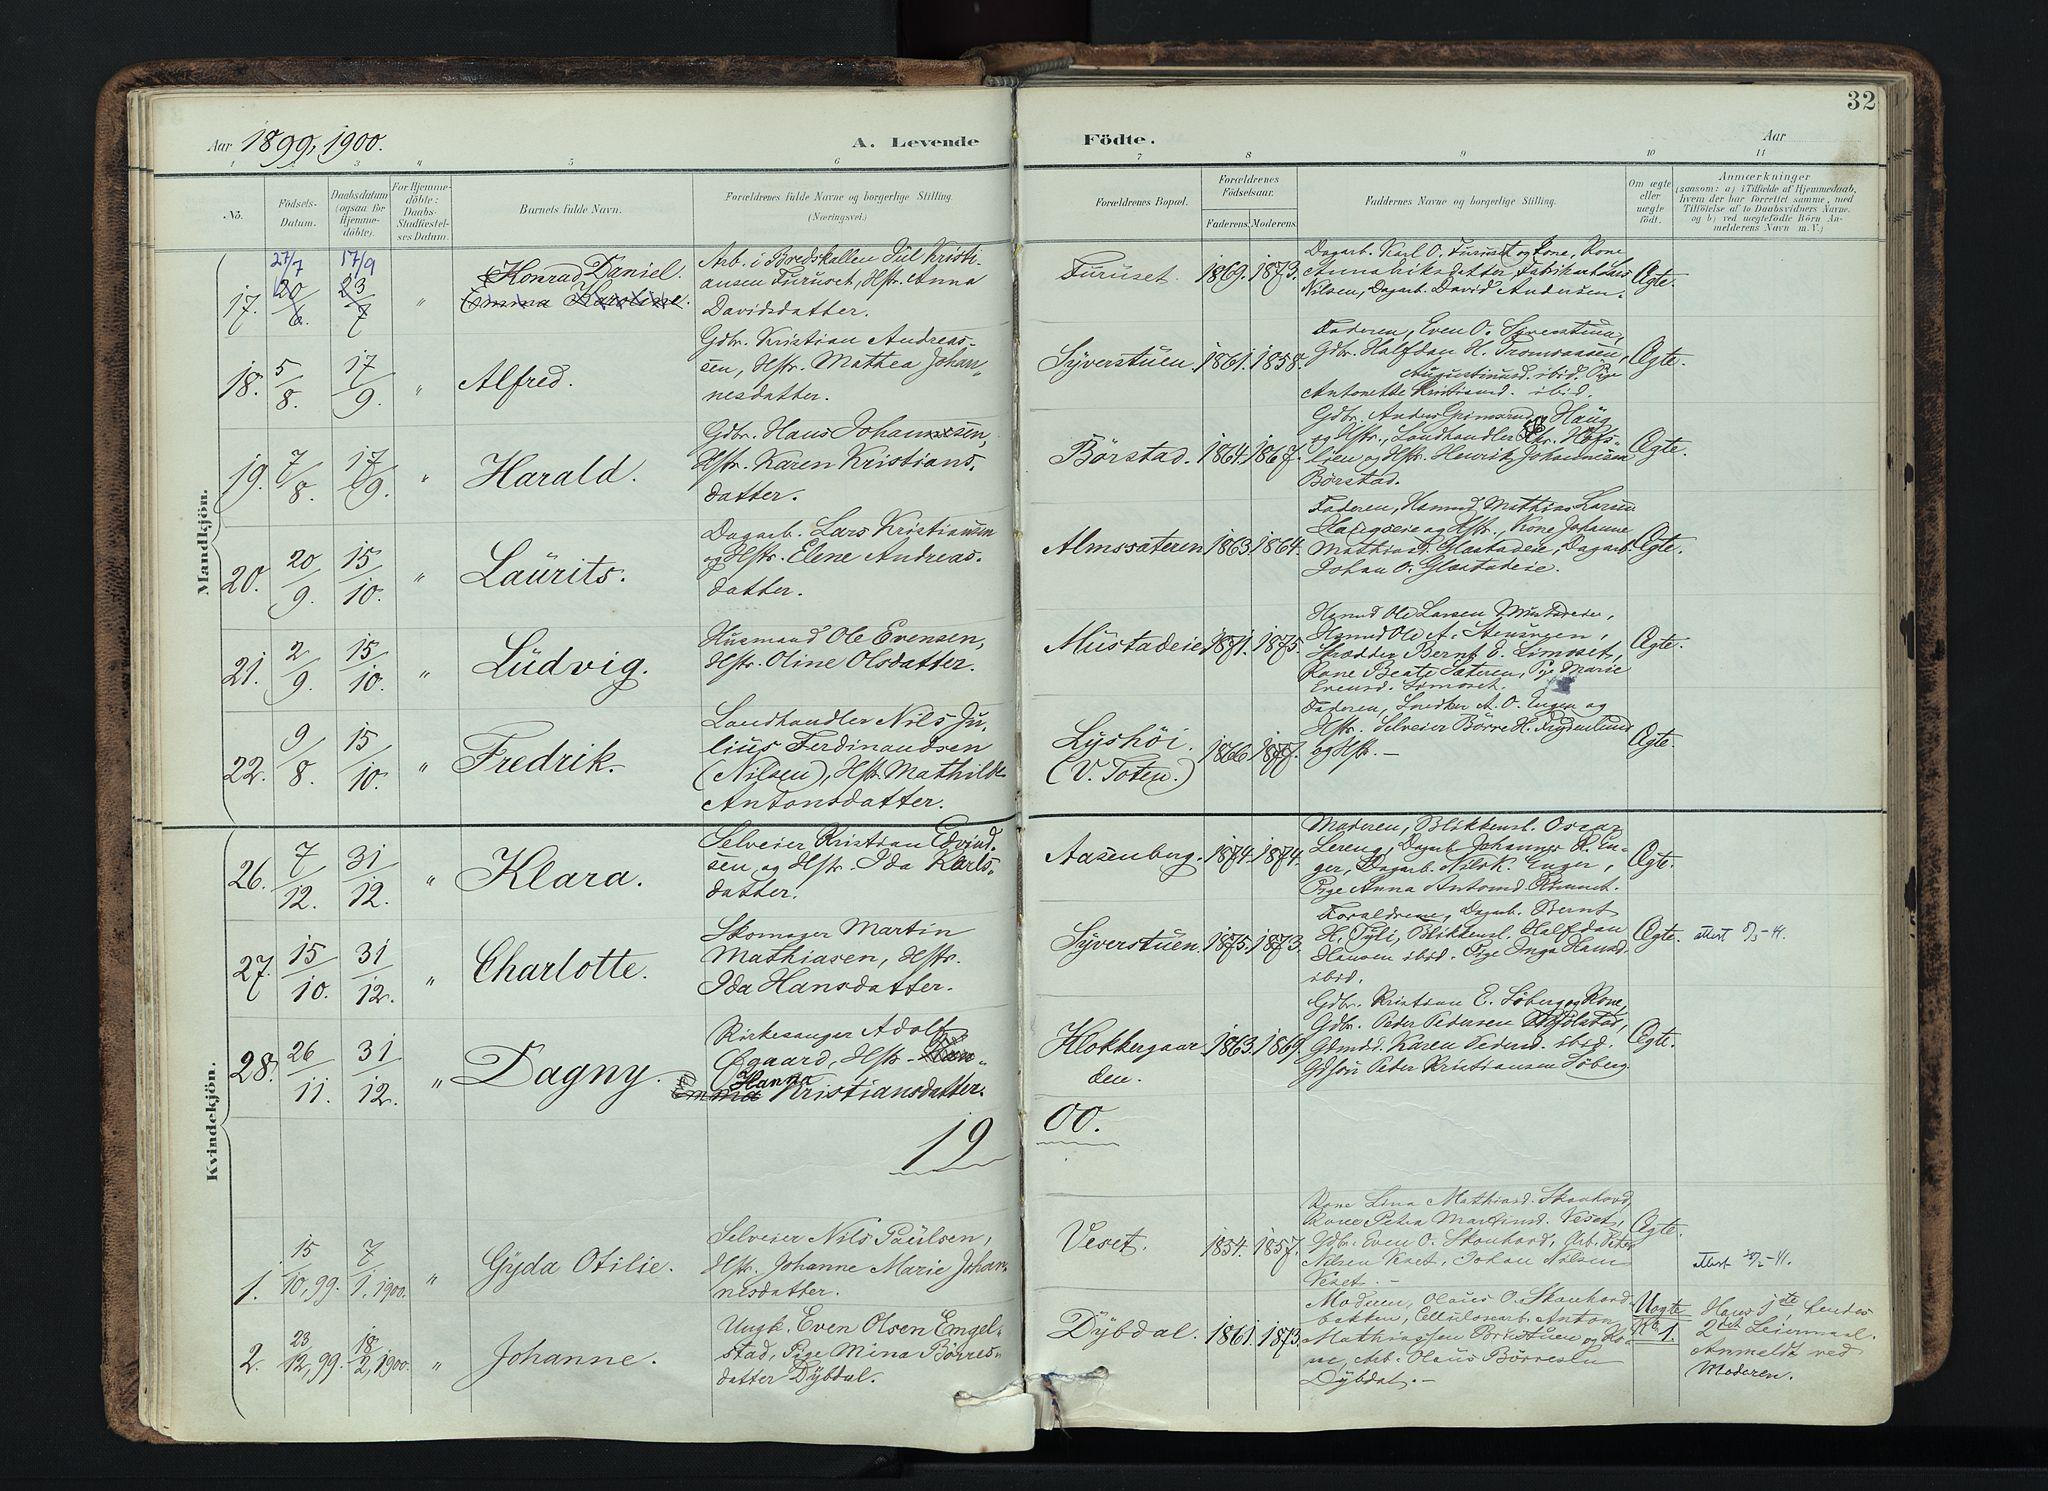 SAH, Vardal prestekontor, H/Ha/Haa/L0019: Ministerialbok nr. 19, 1893-1907, s. 32